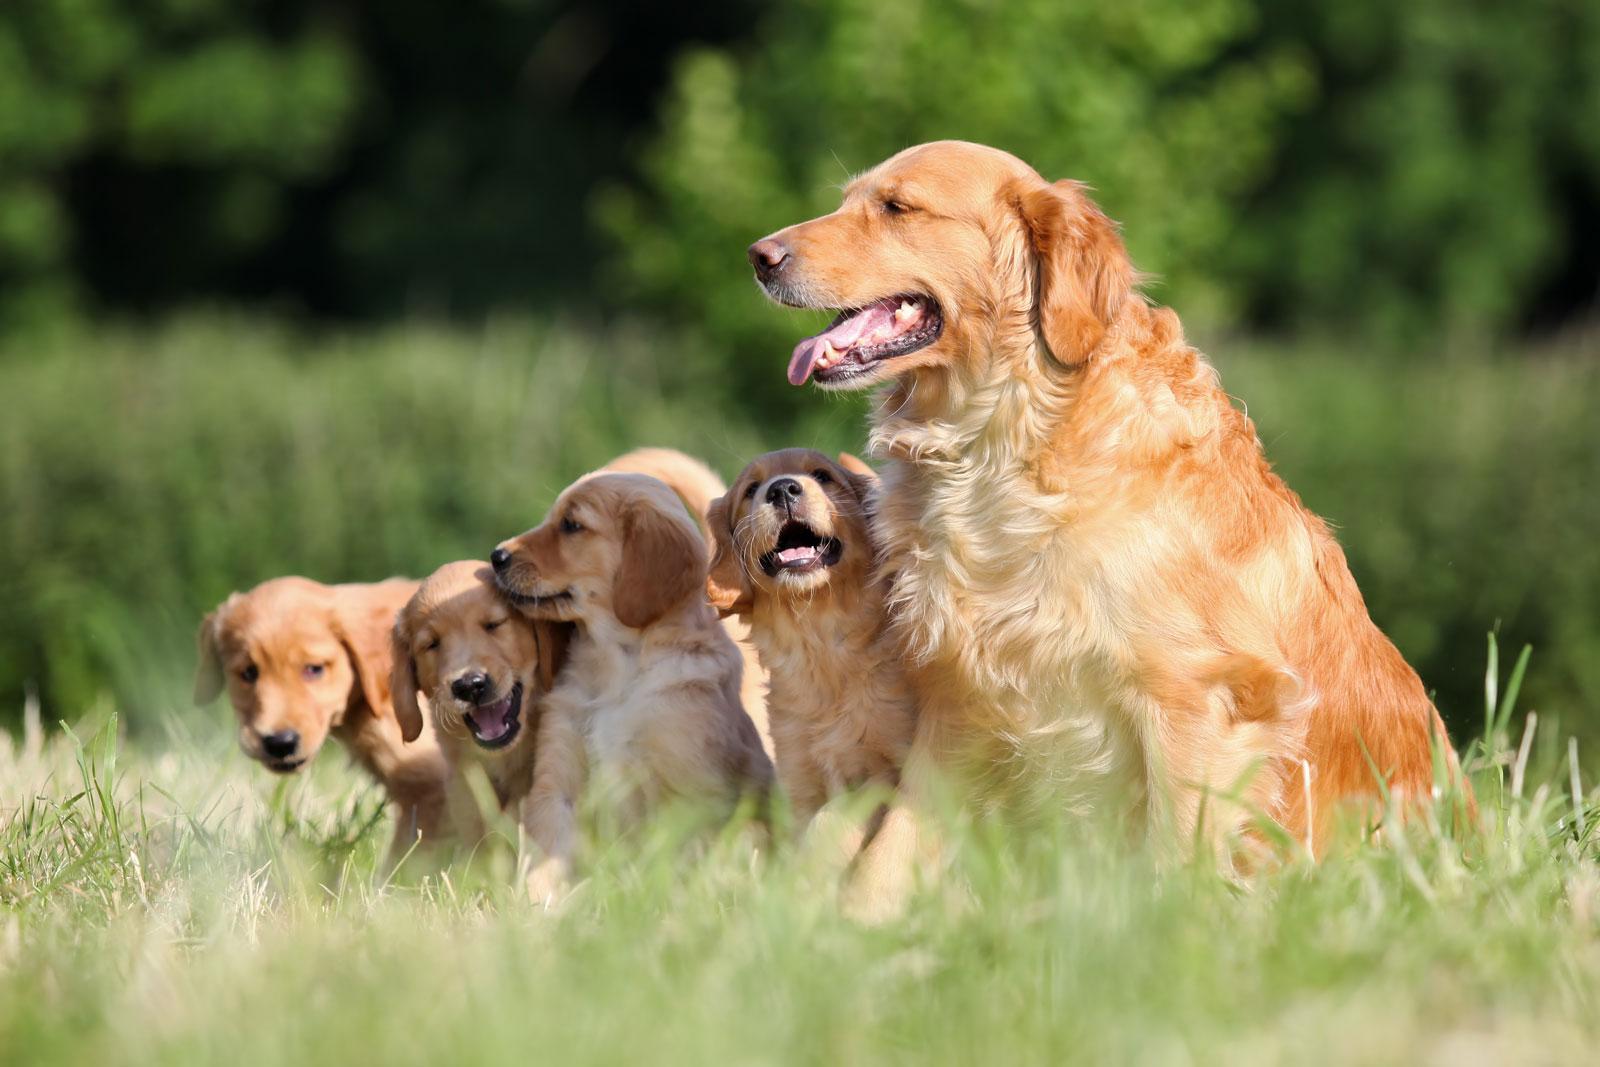 Huấn luyện chó golden